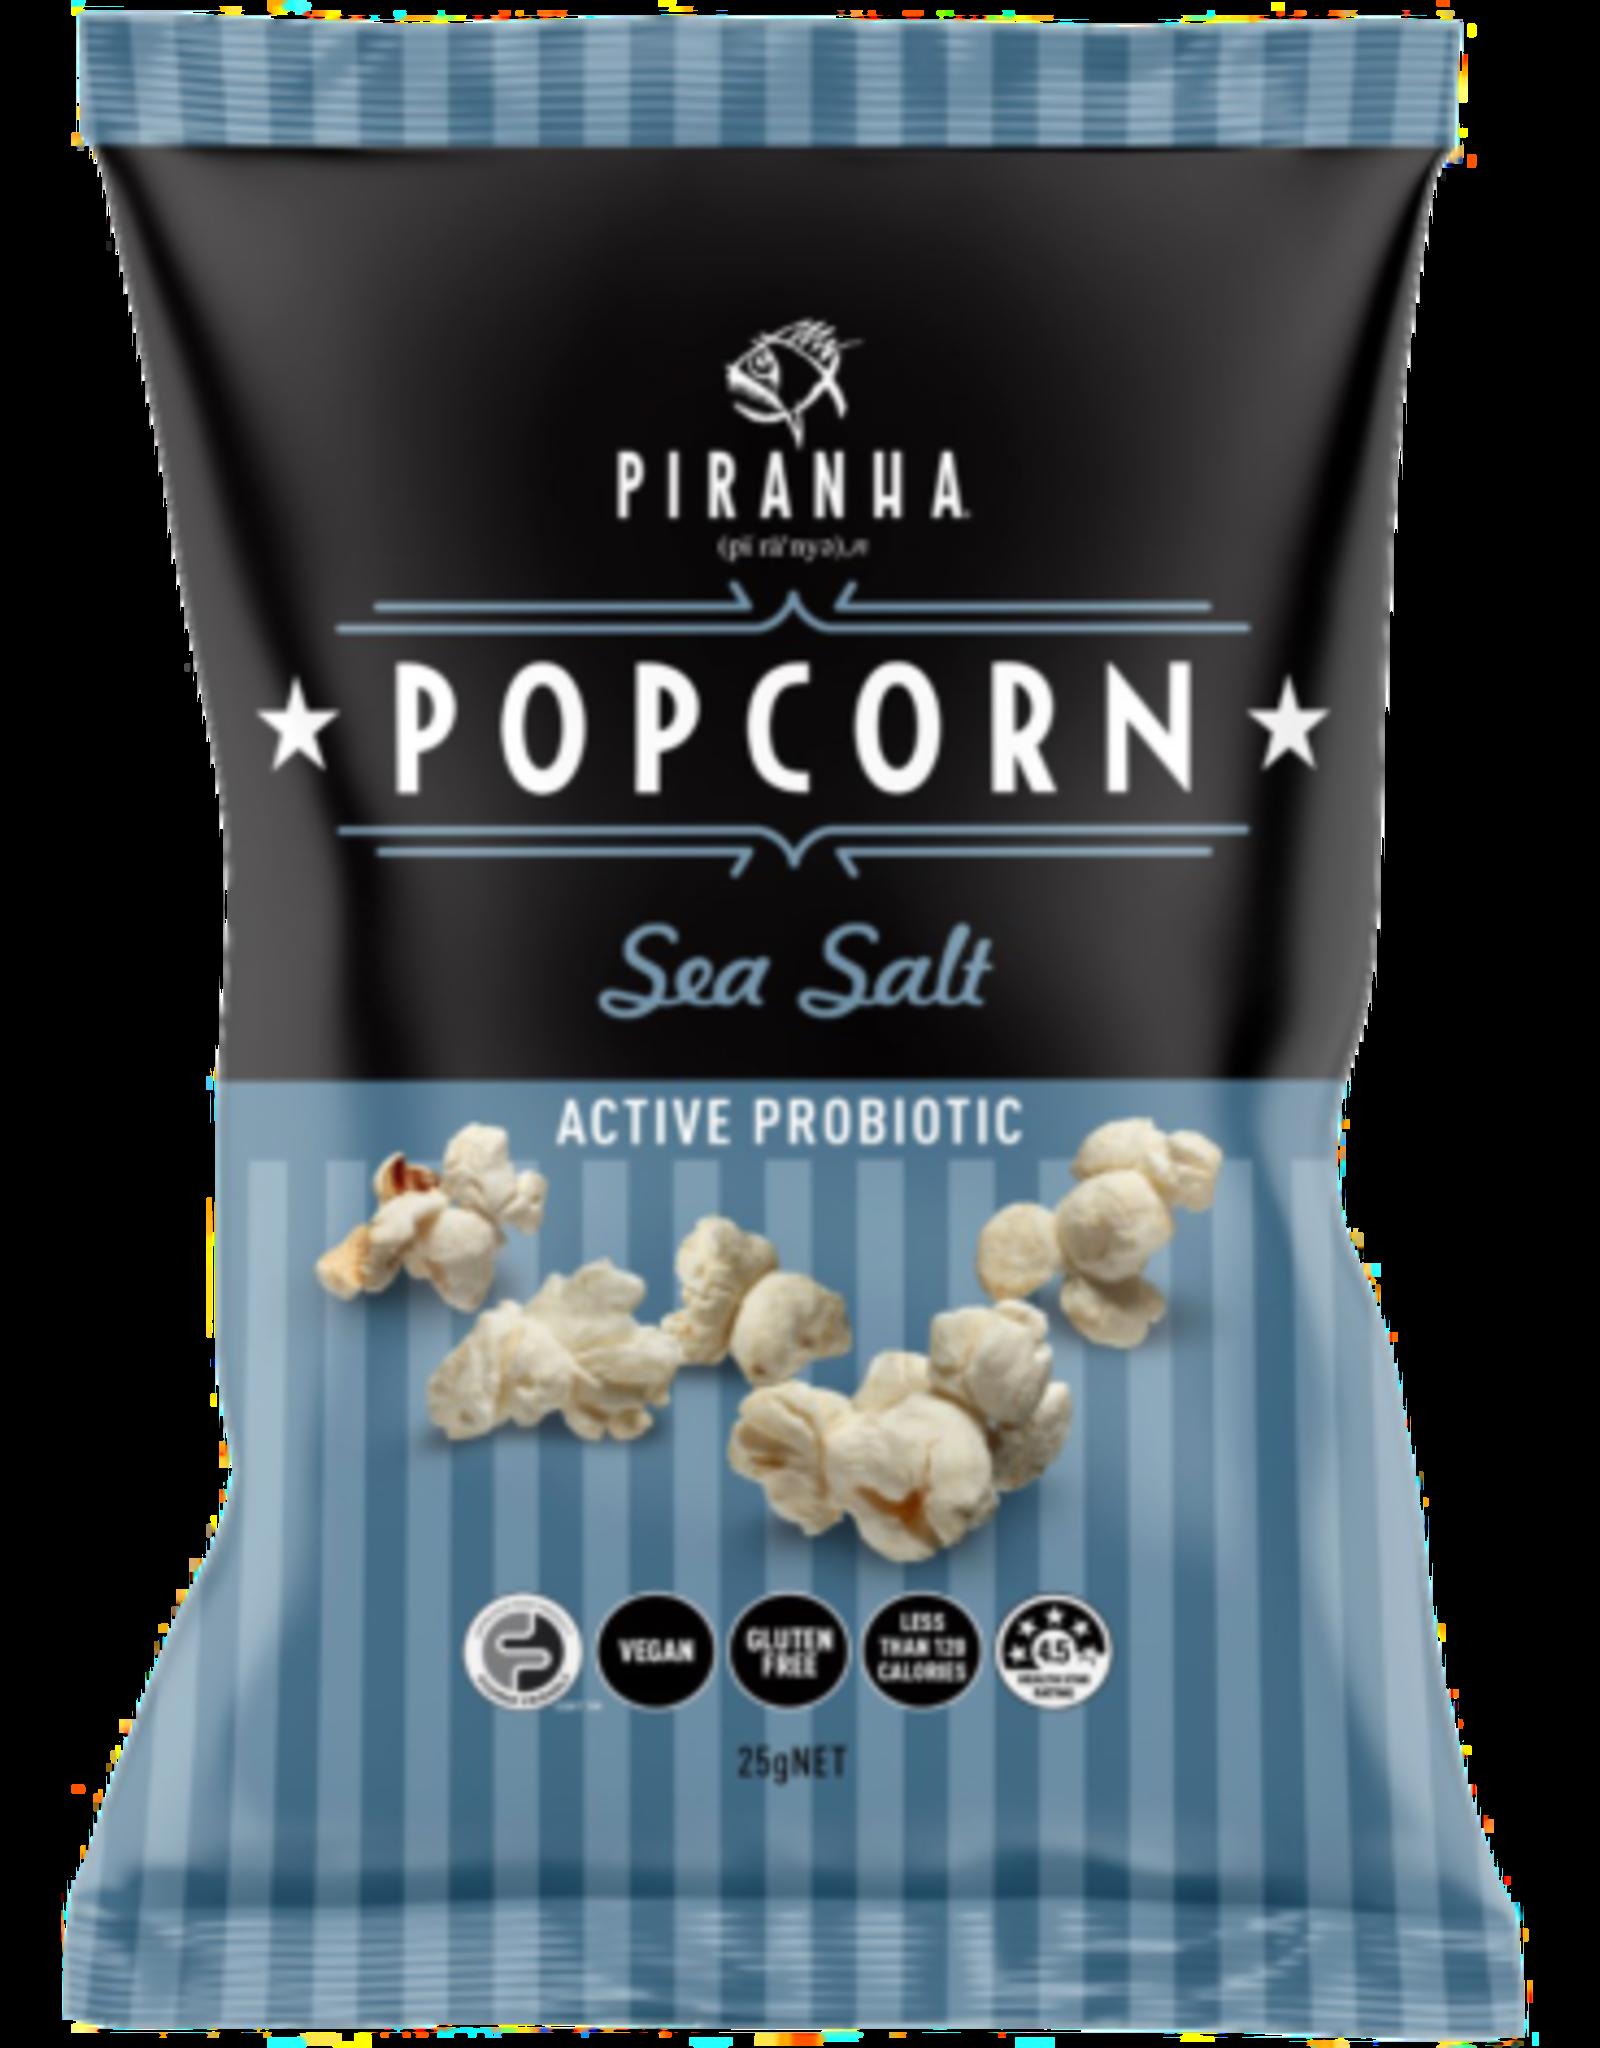 Piranha Sea Salt Popcorn with Probiotics - 25g